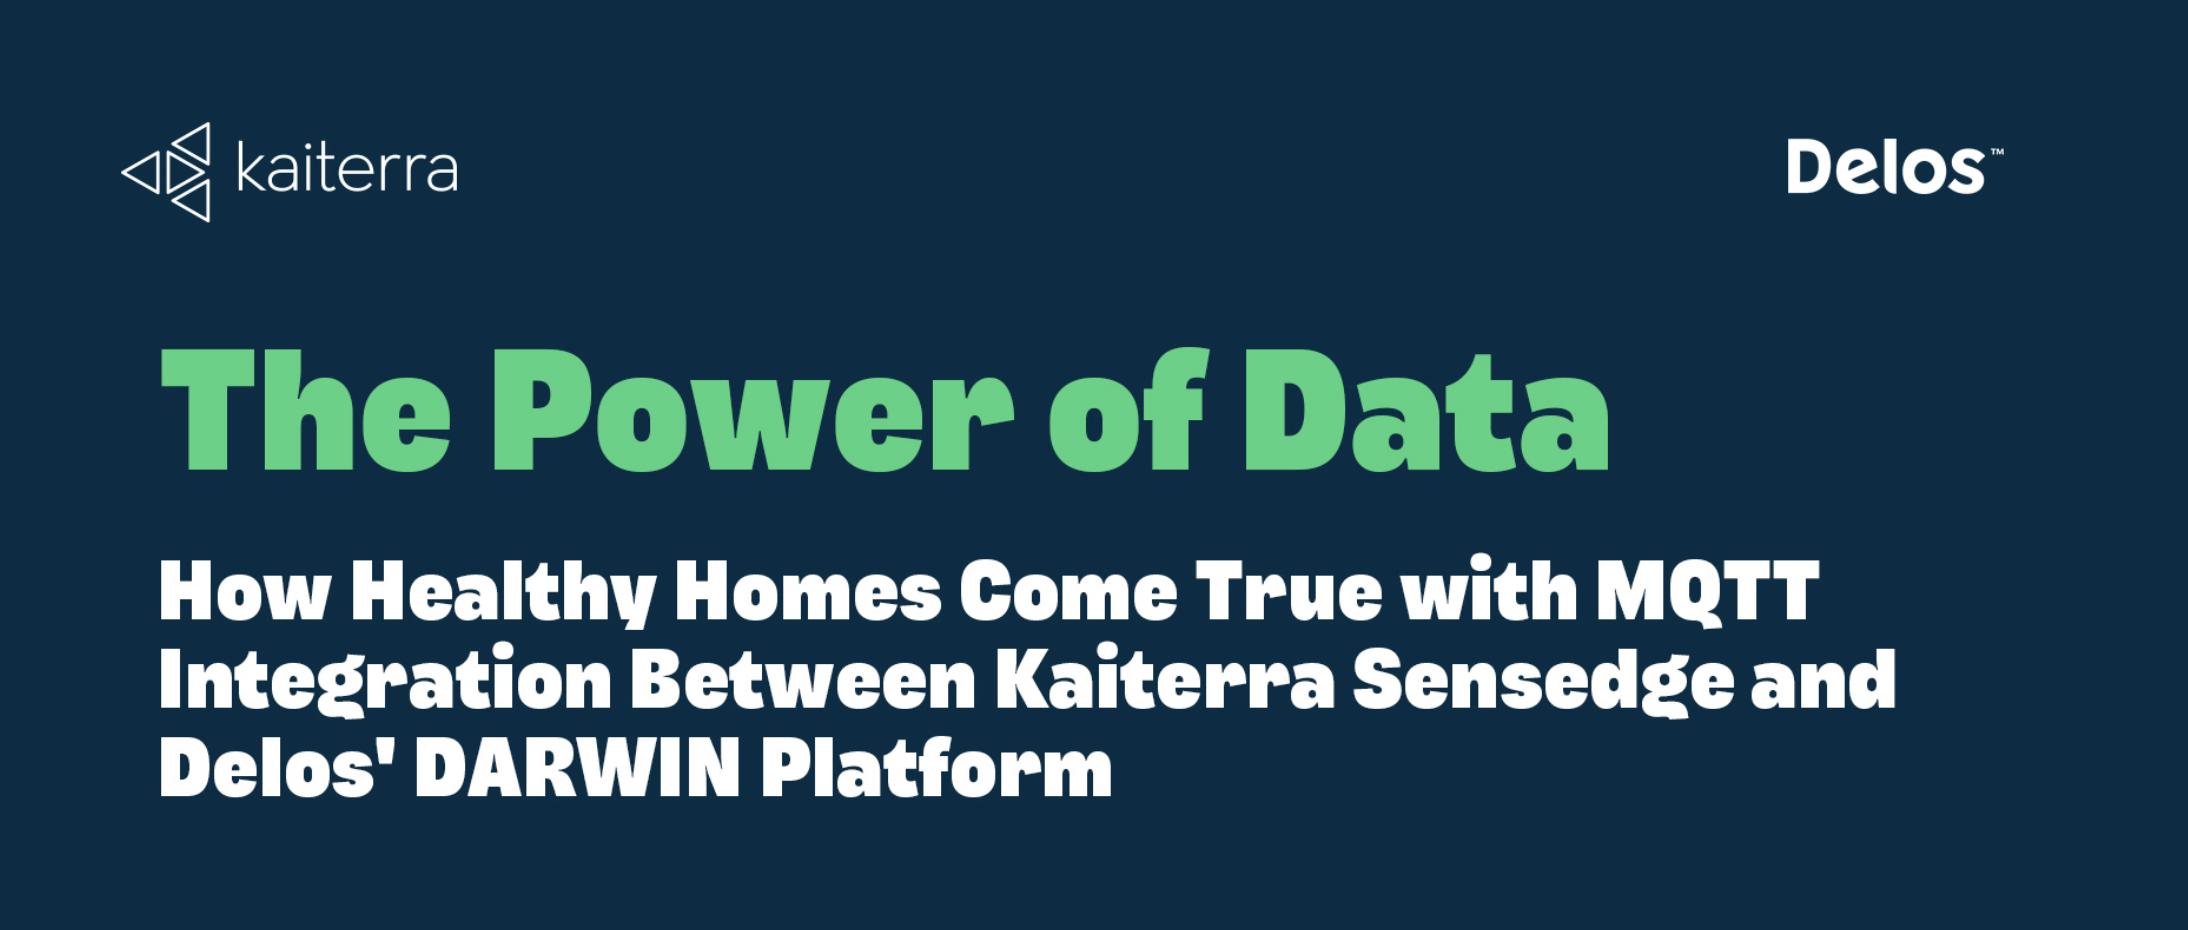 Kaiterra Sensedge Delos DARWIN Integration Case Study